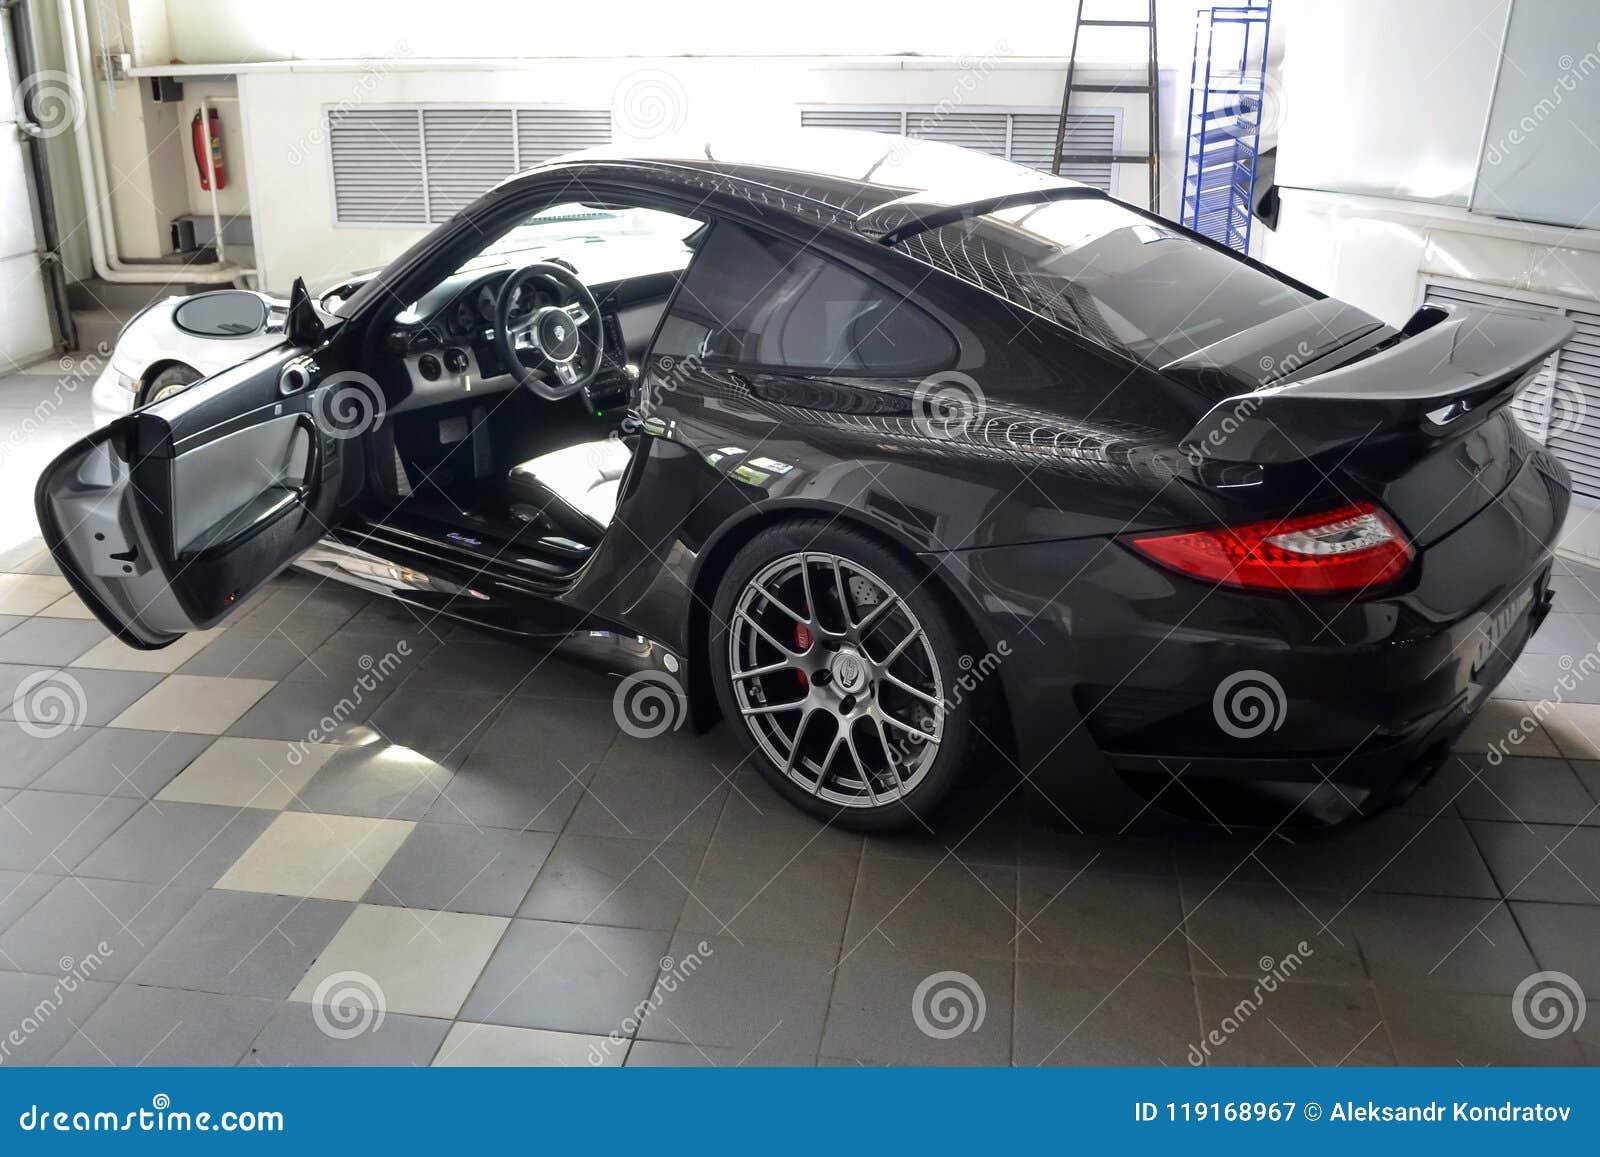 Nowosibirsk, Russland - 06 14 2018: Porsche 911